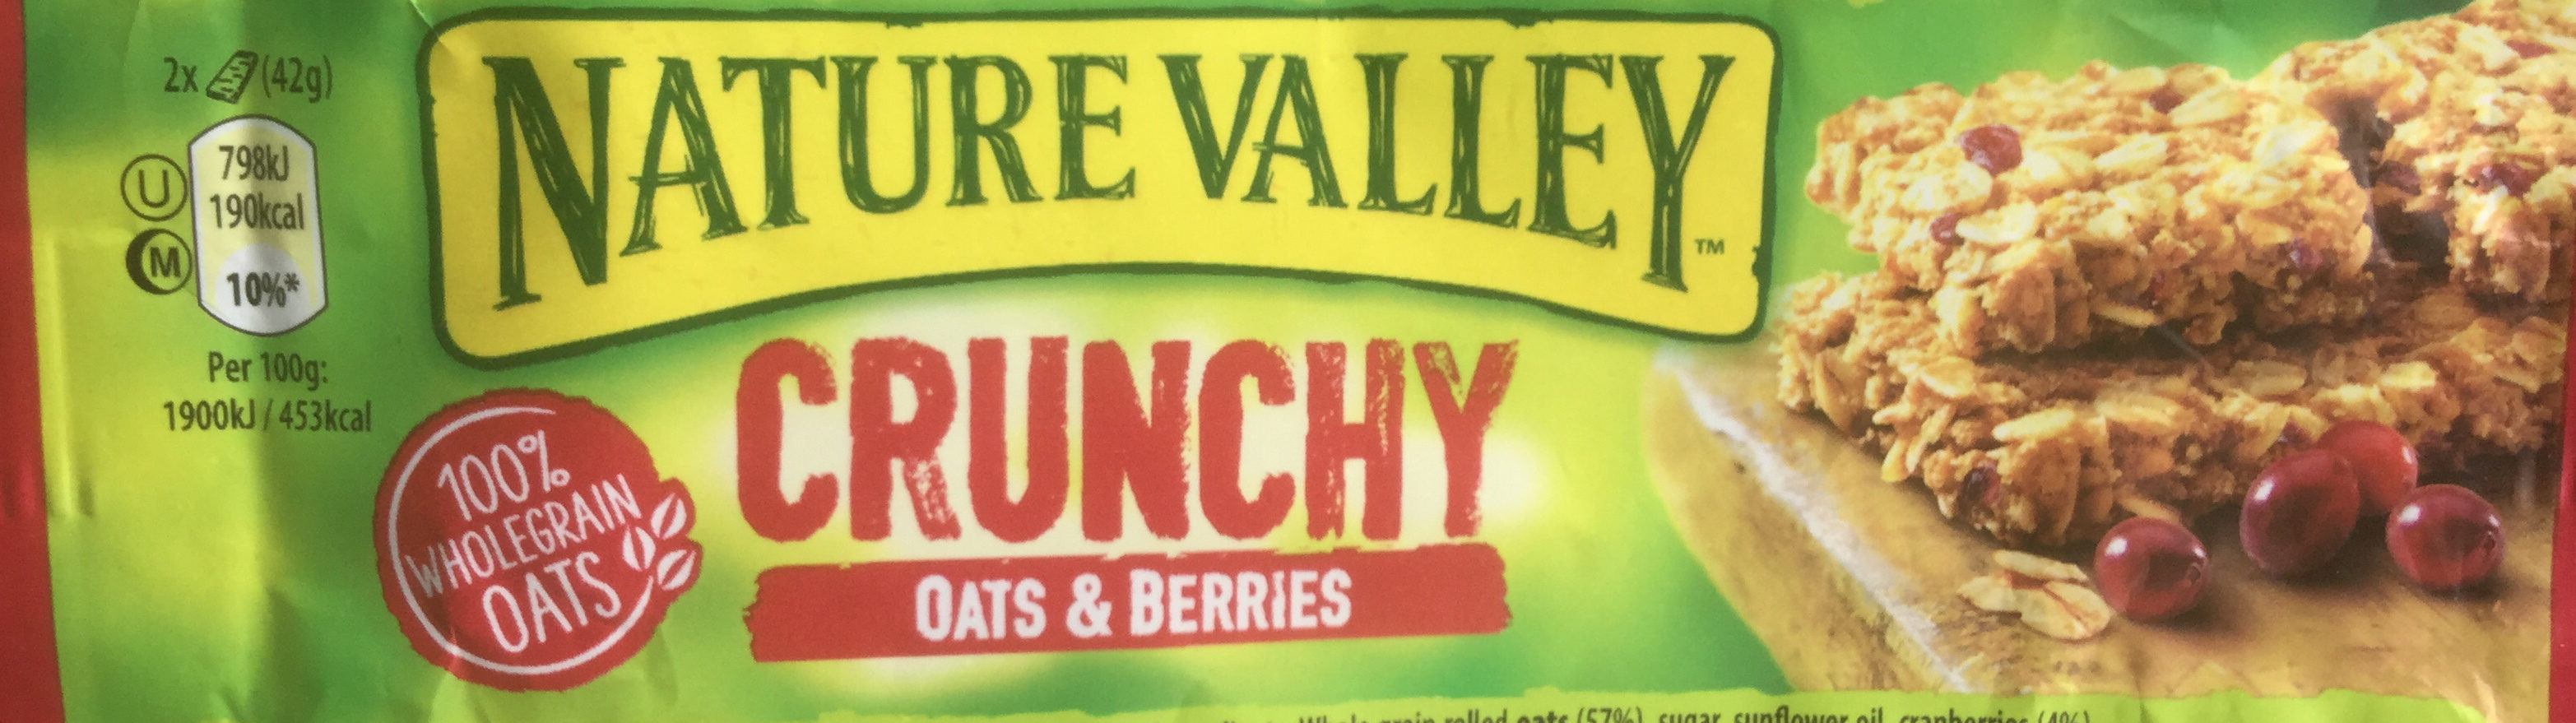 Oats & Berries - Product